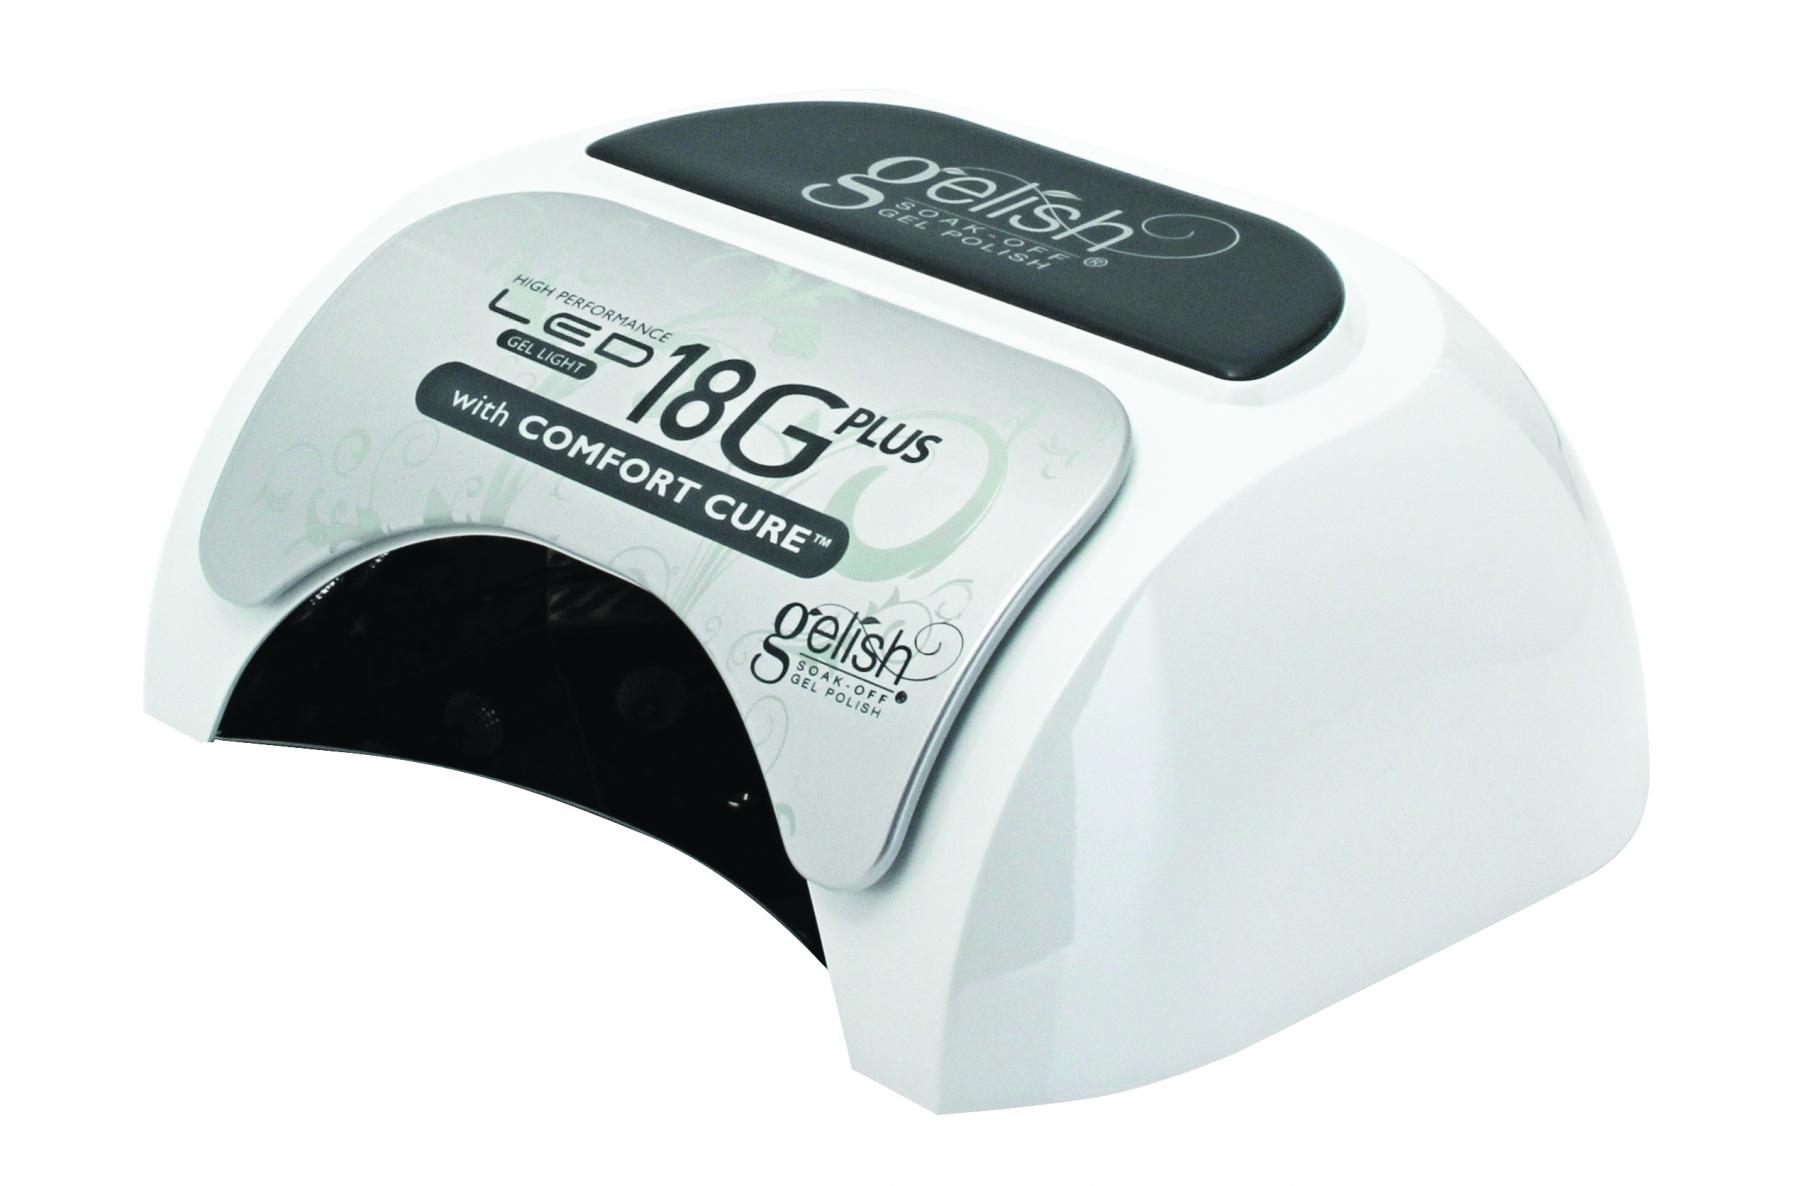 CureGel Polish Comfort Plus Led Lamp Gelish 18g With pzGLqUMSV